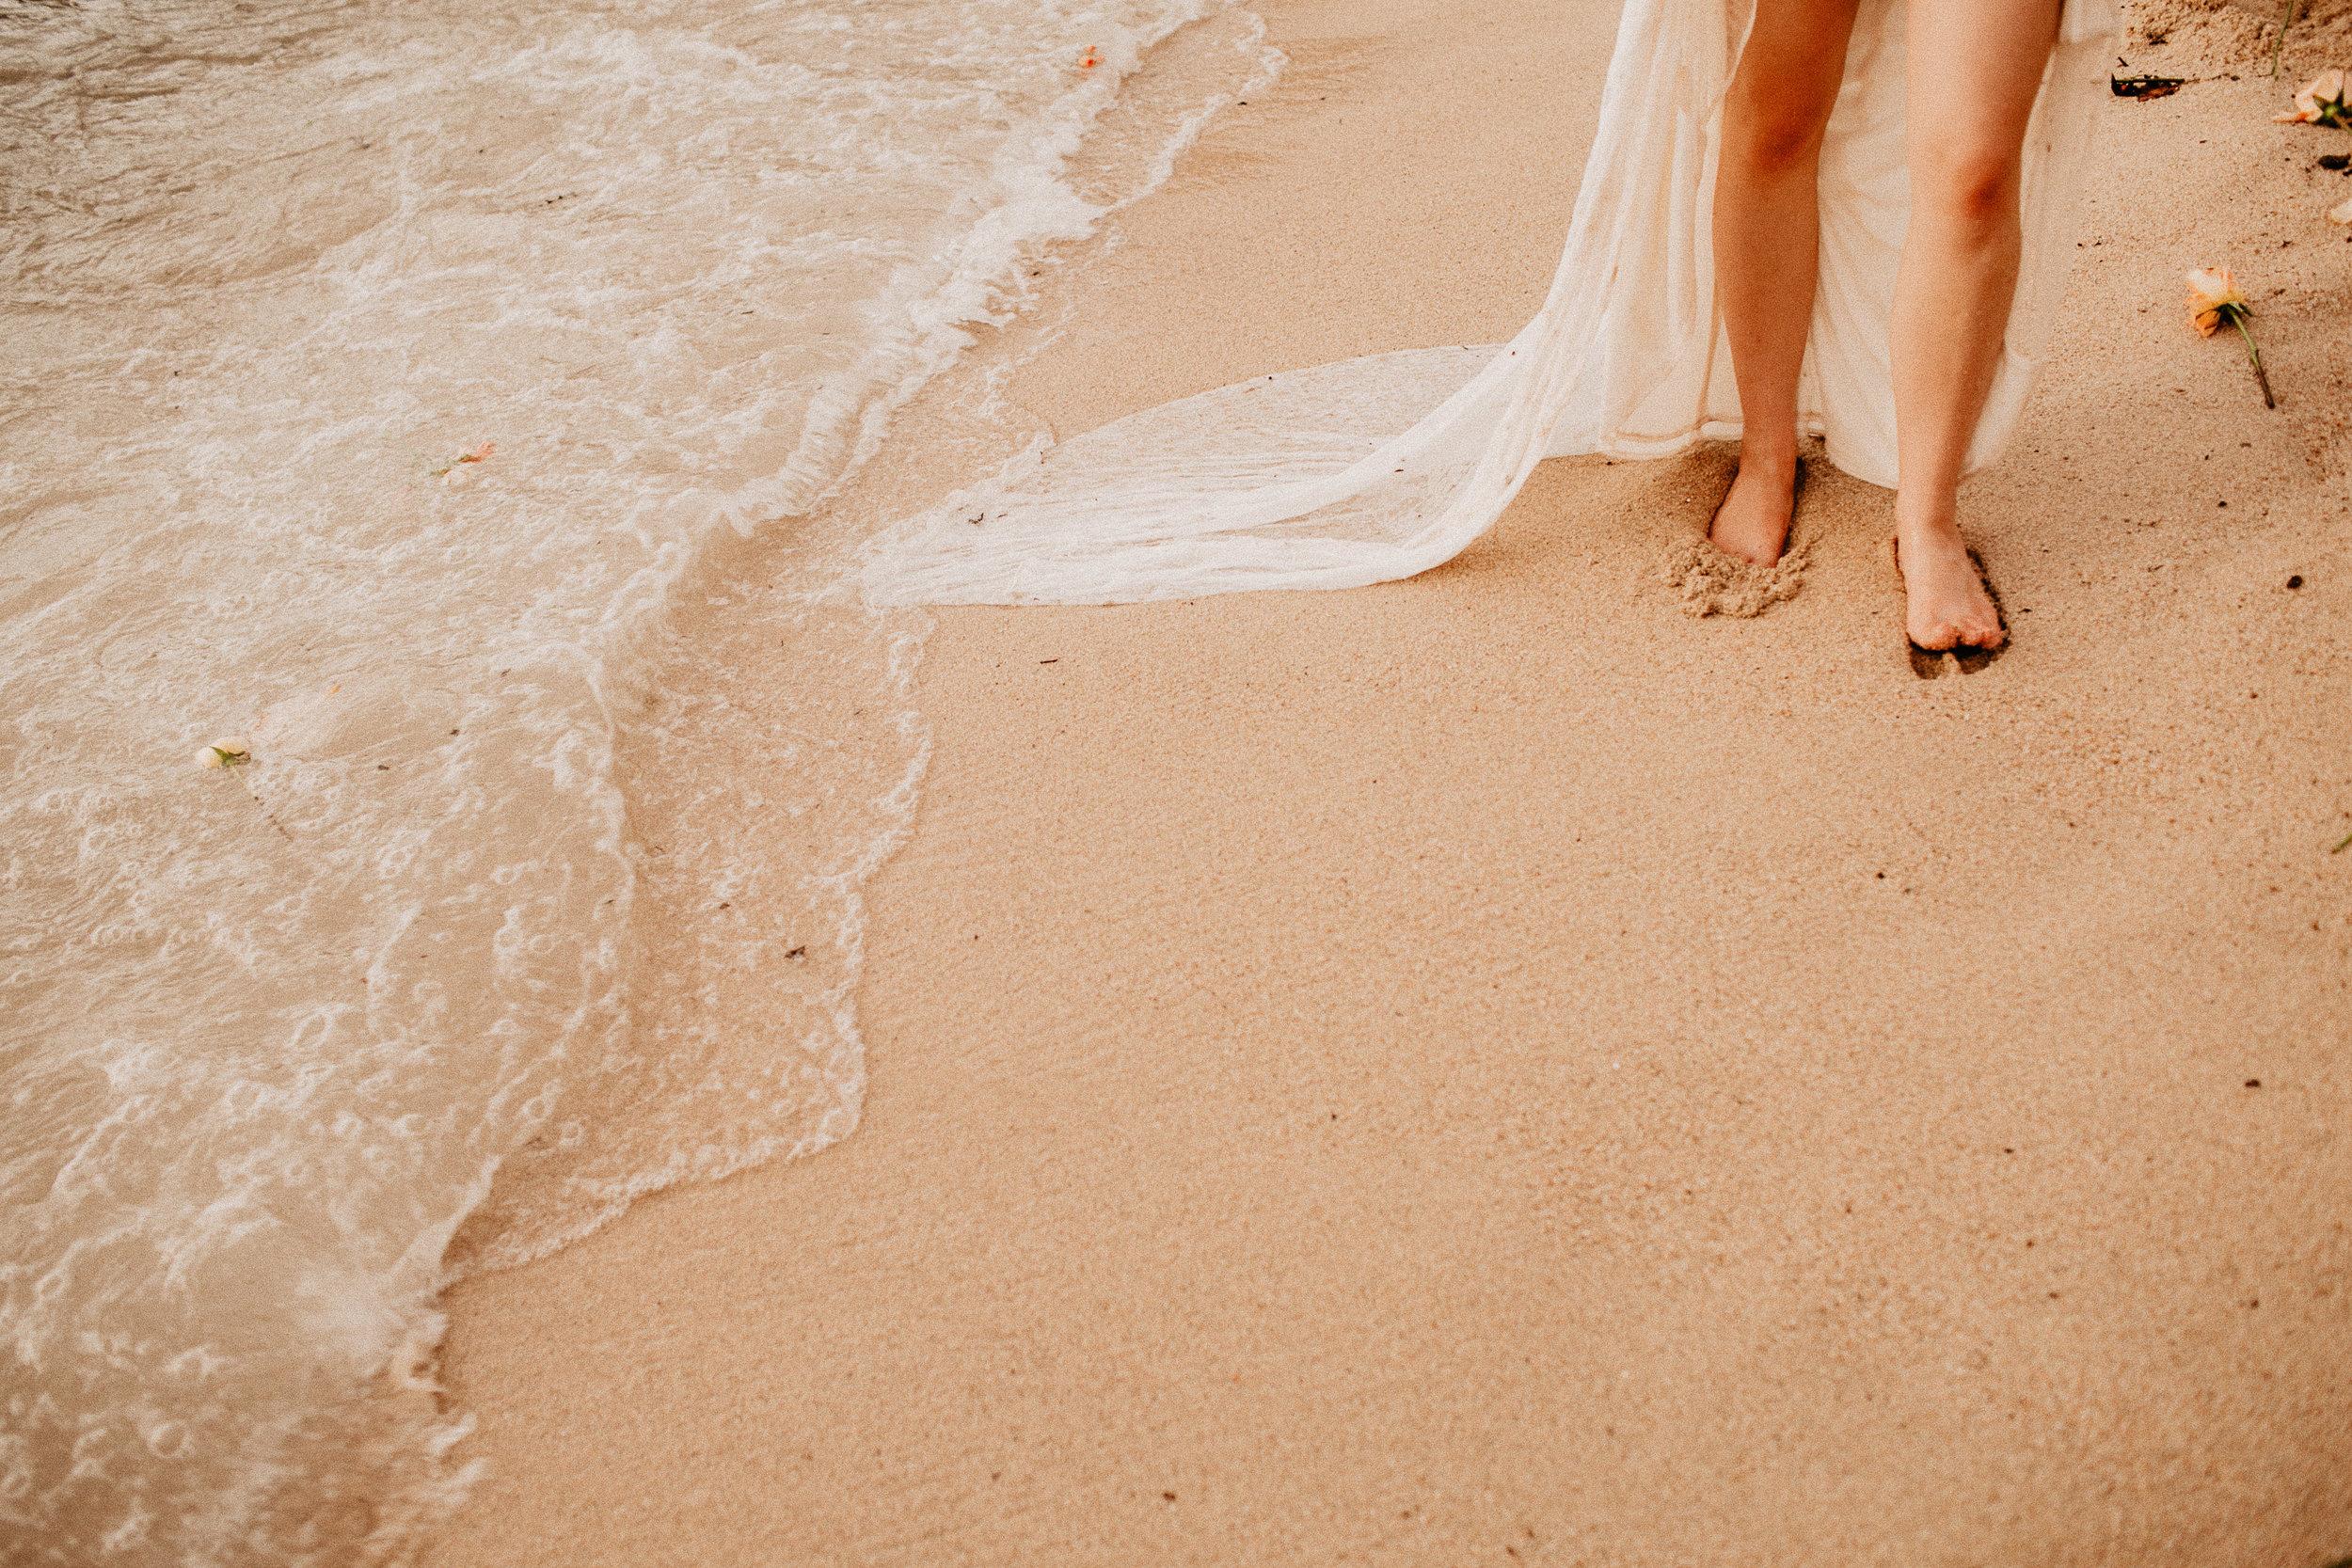 alfonso_flores_destination_wedding_photography_puerto_vallarta_hotel_barcelo_vallarta_cuttler_amela-828.JPG